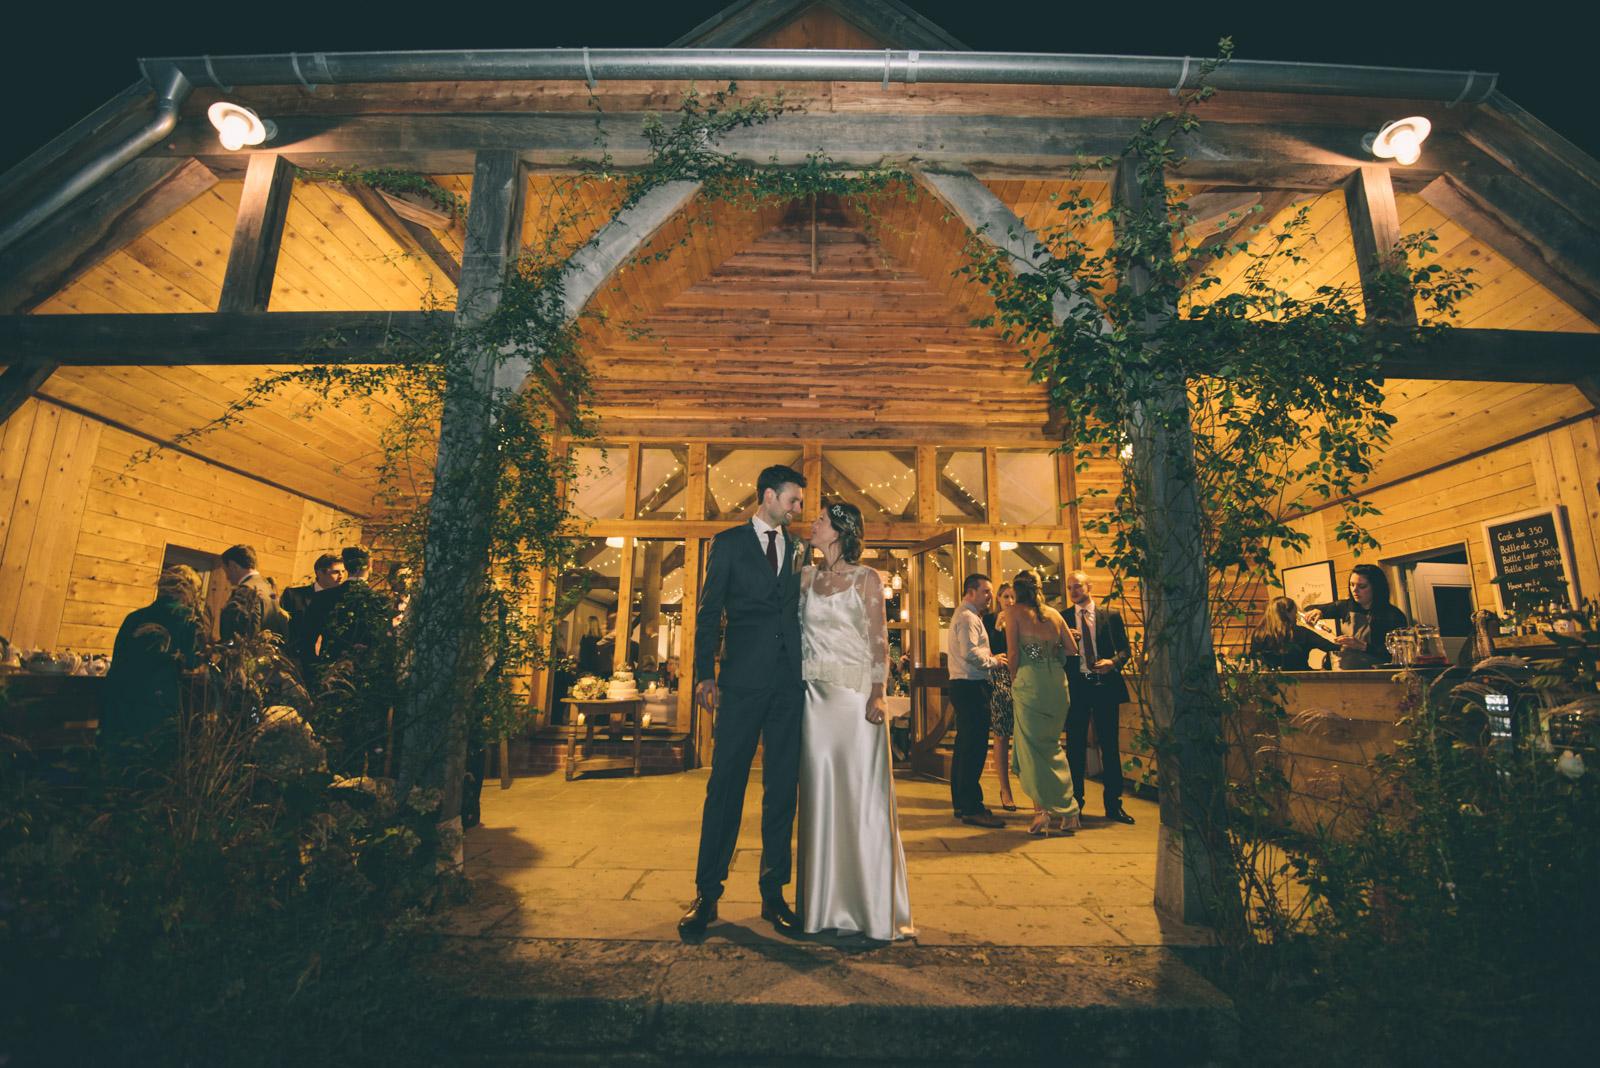 nancarrow-wedding-photography-158.jpg